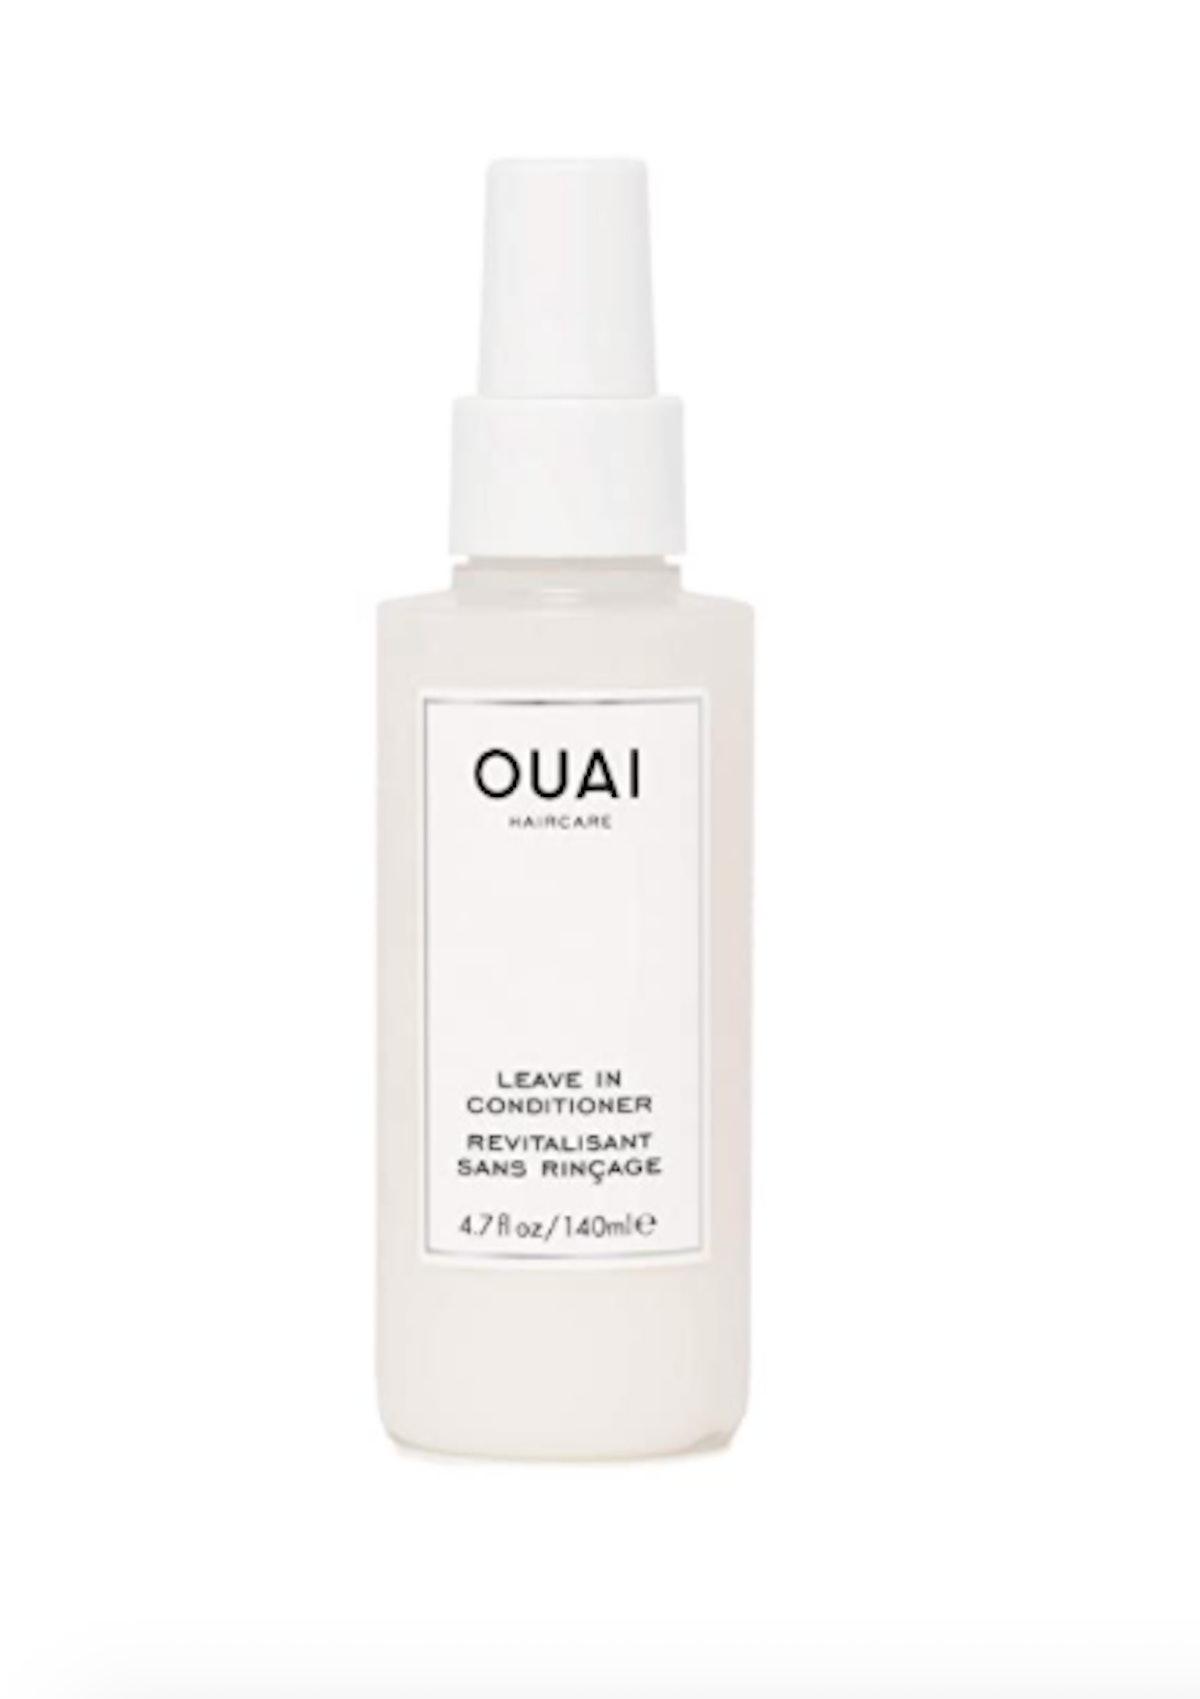 OUAI Leave-In Conditioner (4.7 Oz.)